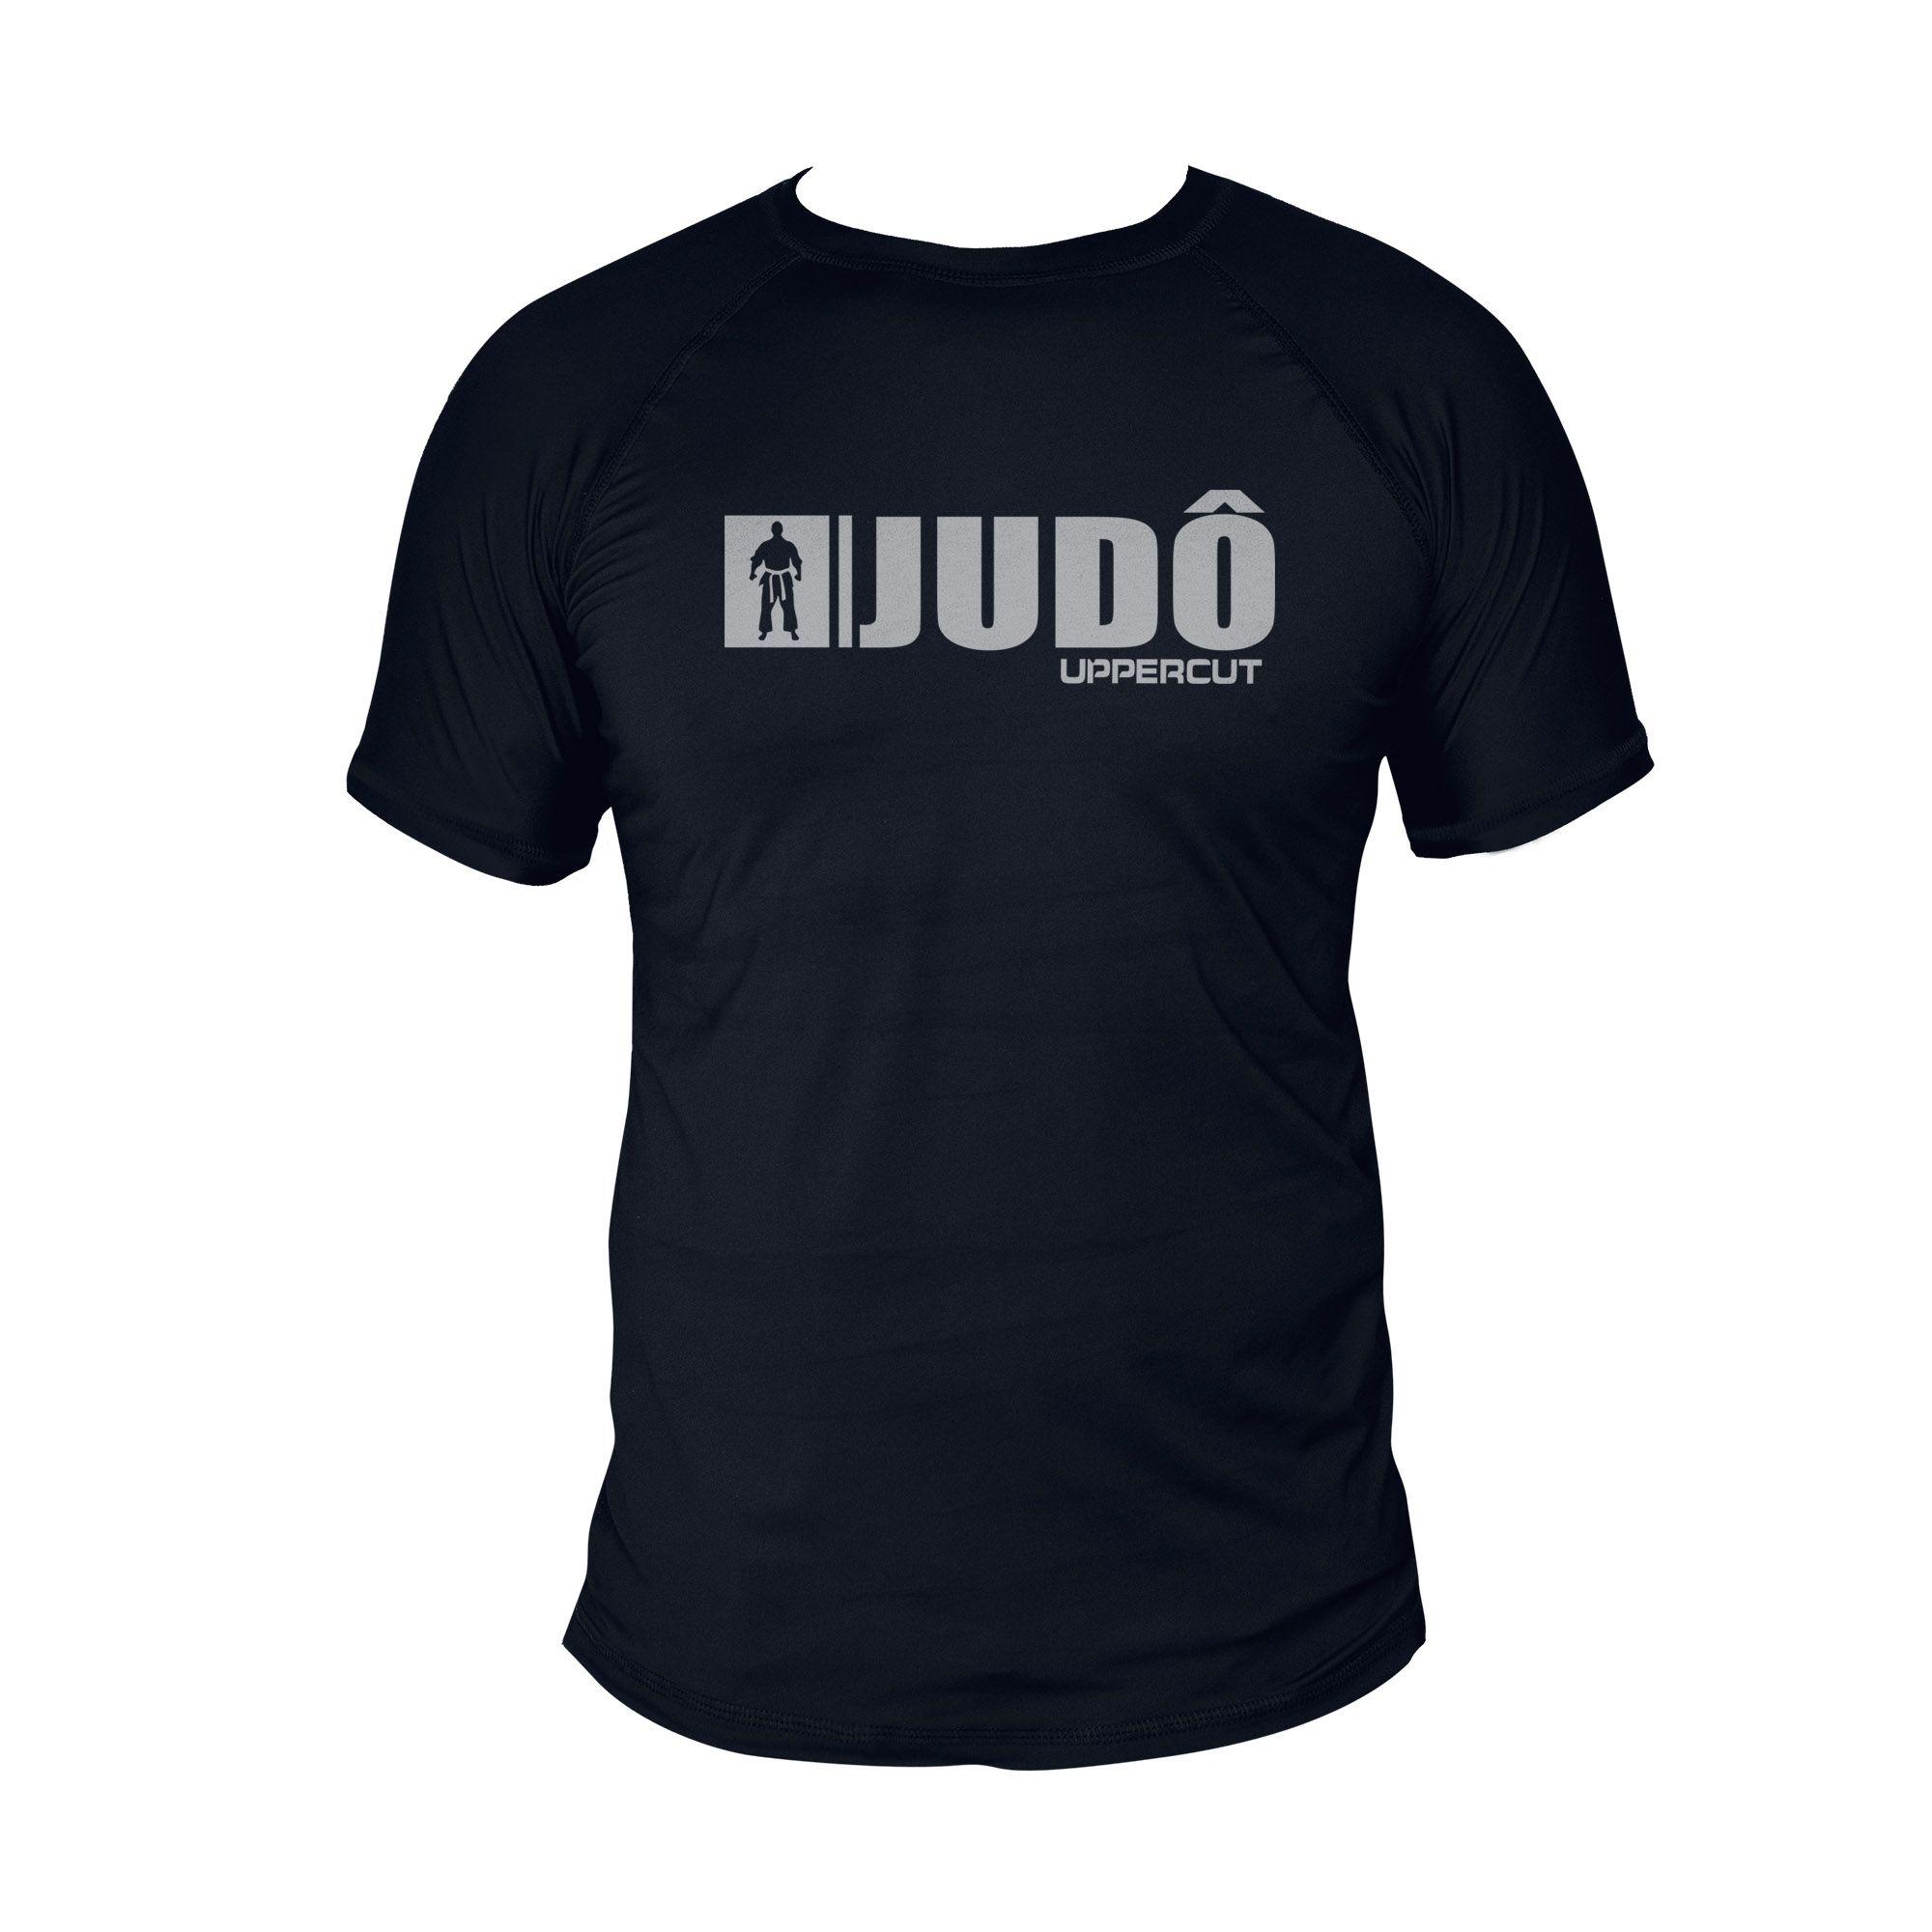 Camiseta Judo U-093 - Treino Passeio Dry Fit UV50+ - Preta